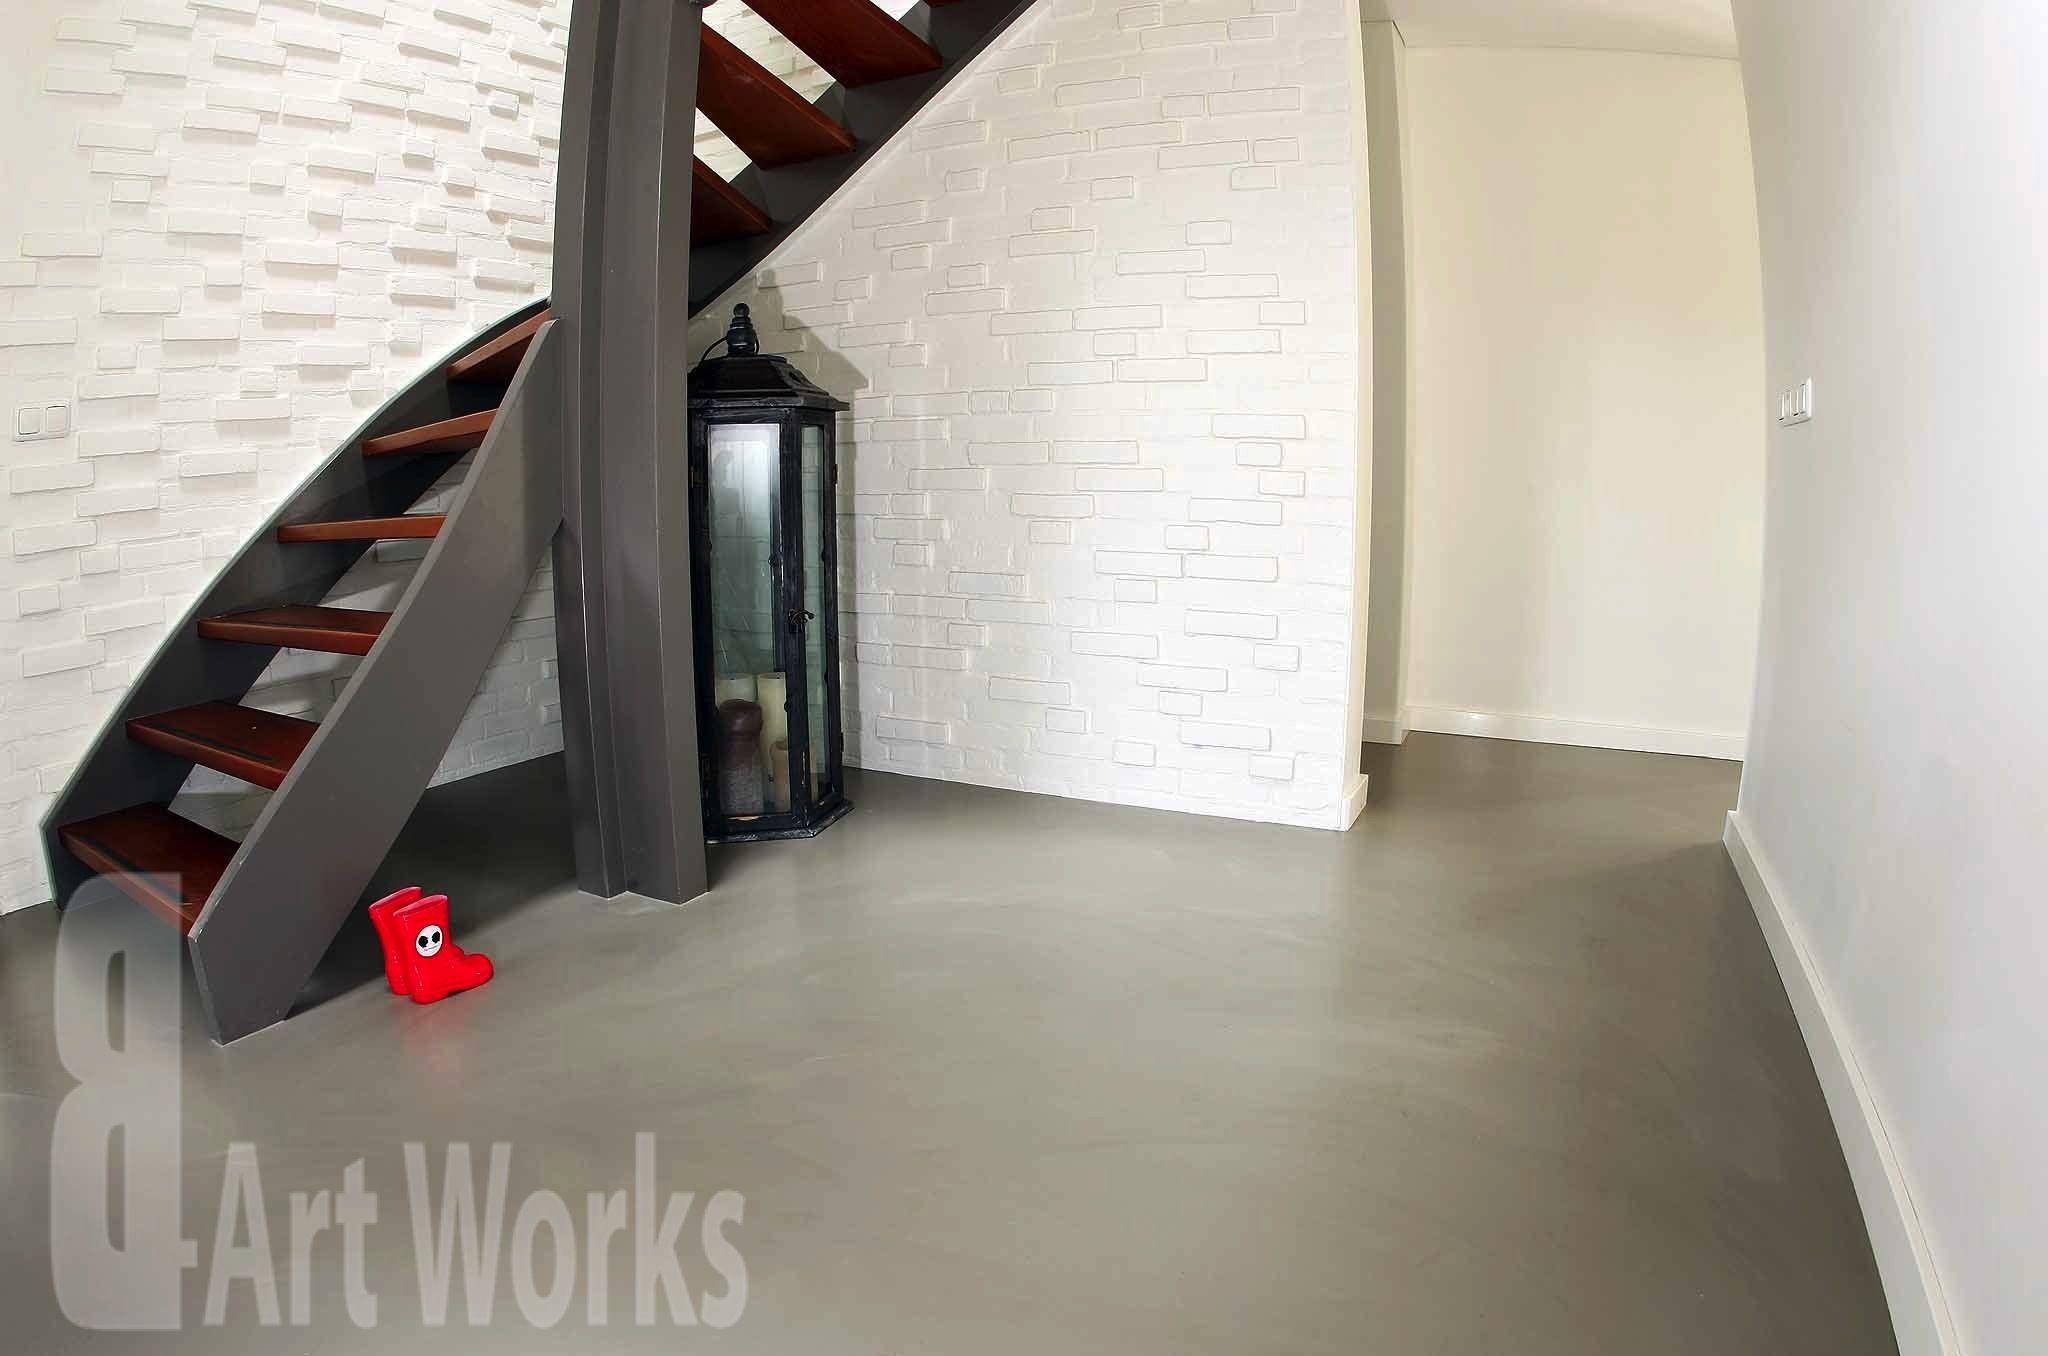 duo art gietvloer polyurethaan kantoorruimte real estate te